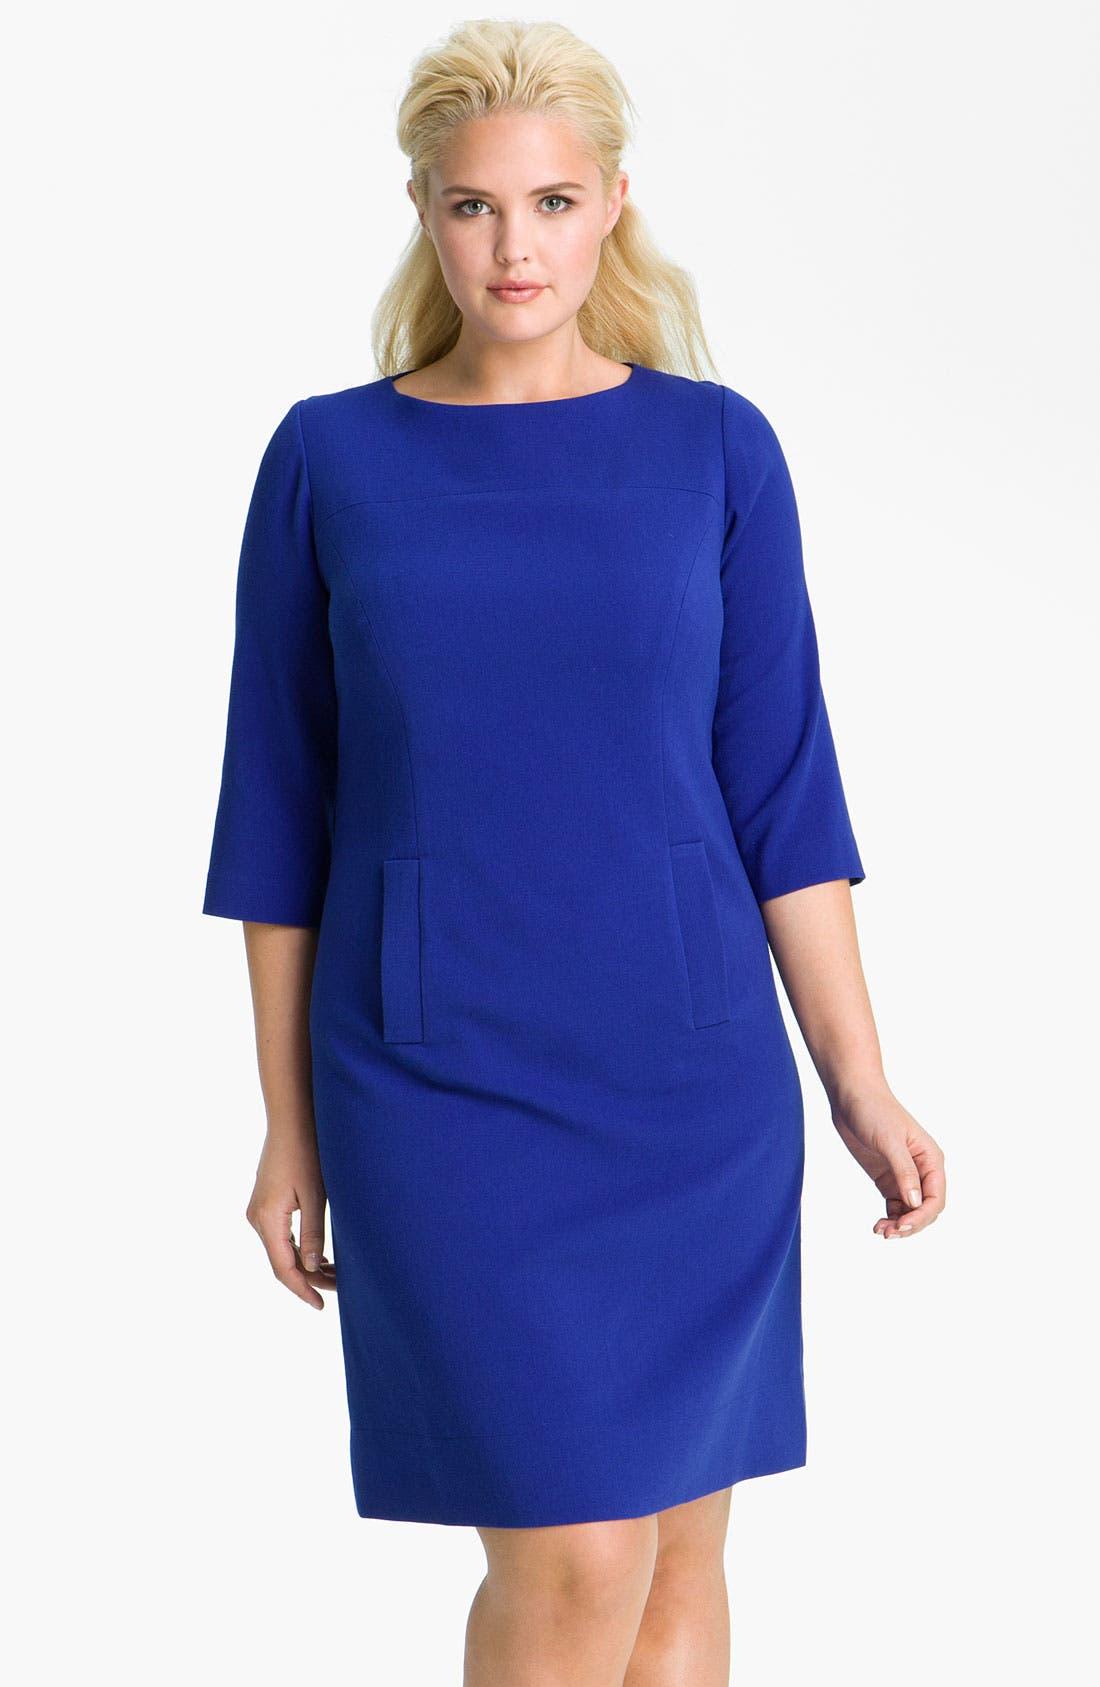 Alternate Image 1 Selected - Eliza J Ponte Knit Shift Dress (Plus)